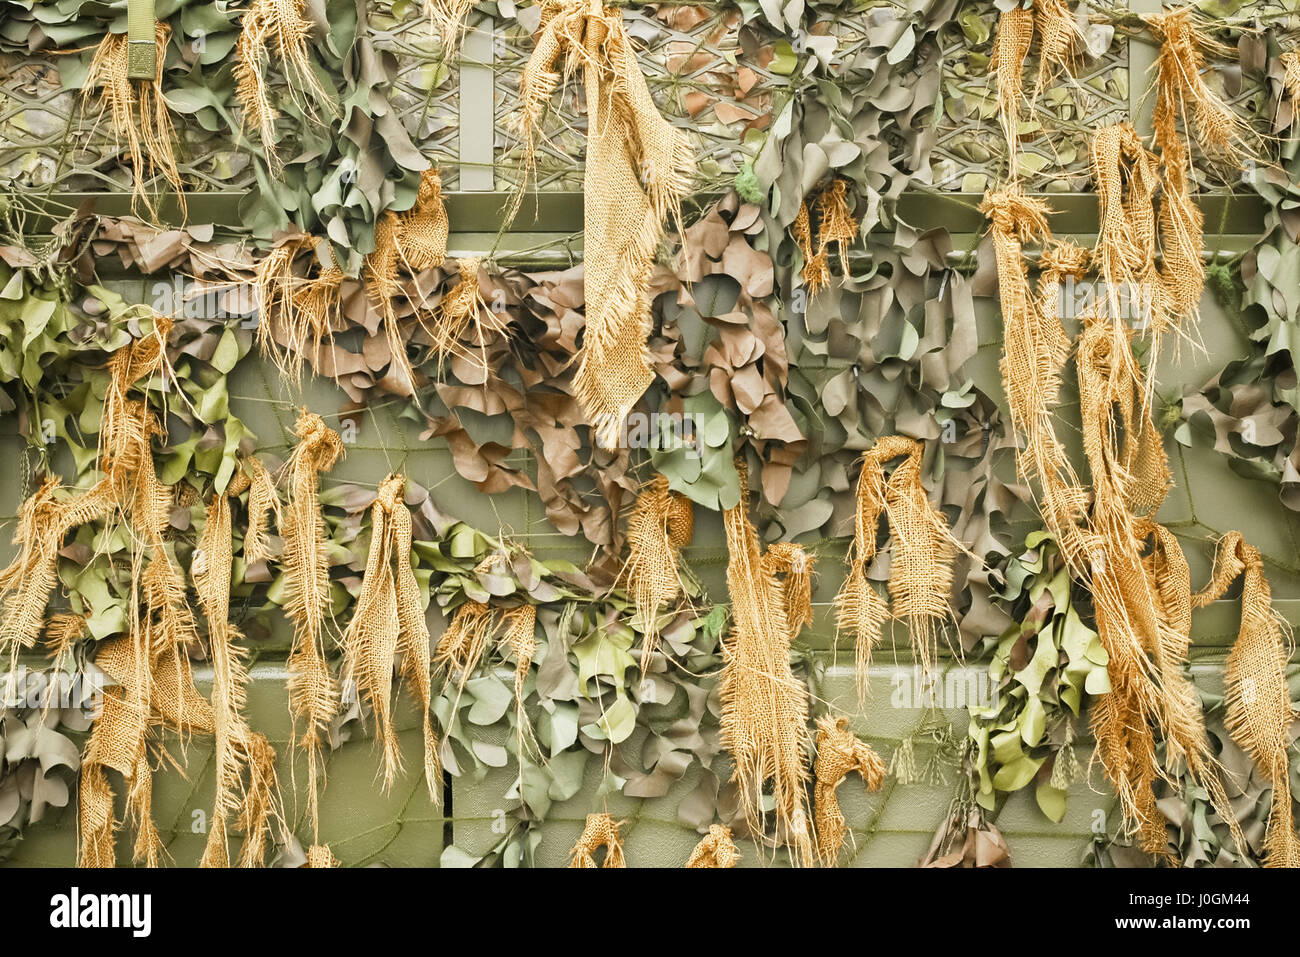 background of military camouflage netting - Stock Image